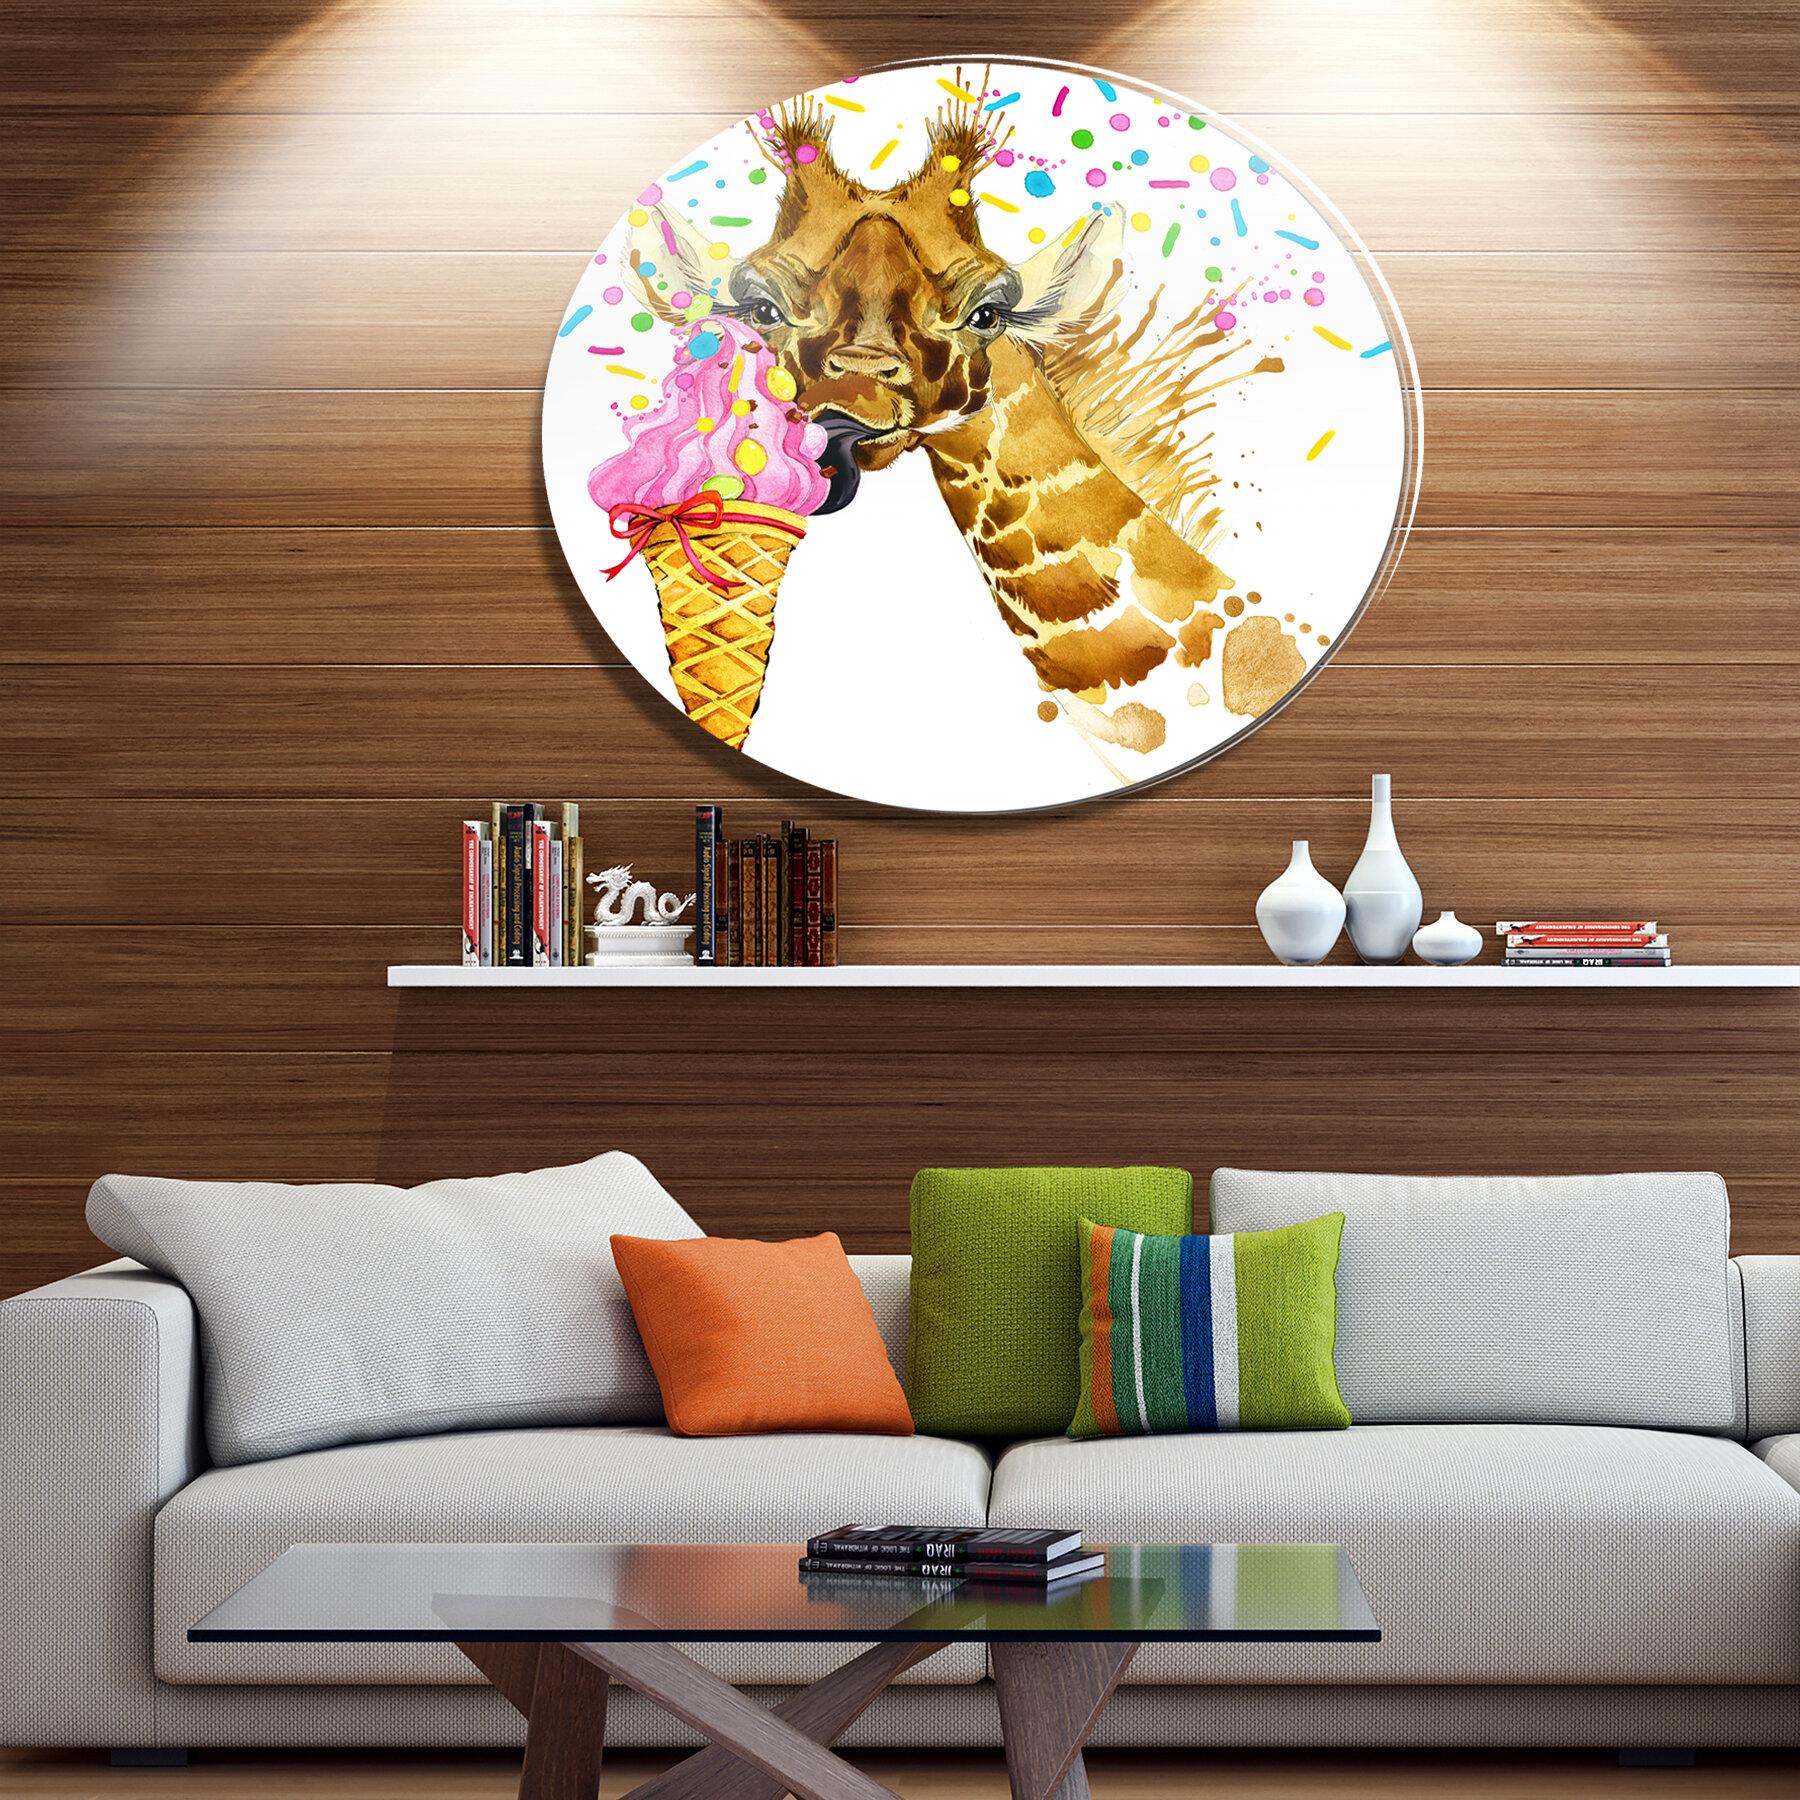 Designart Giraffe Eating Ice Cream Watercolor Oil Painting